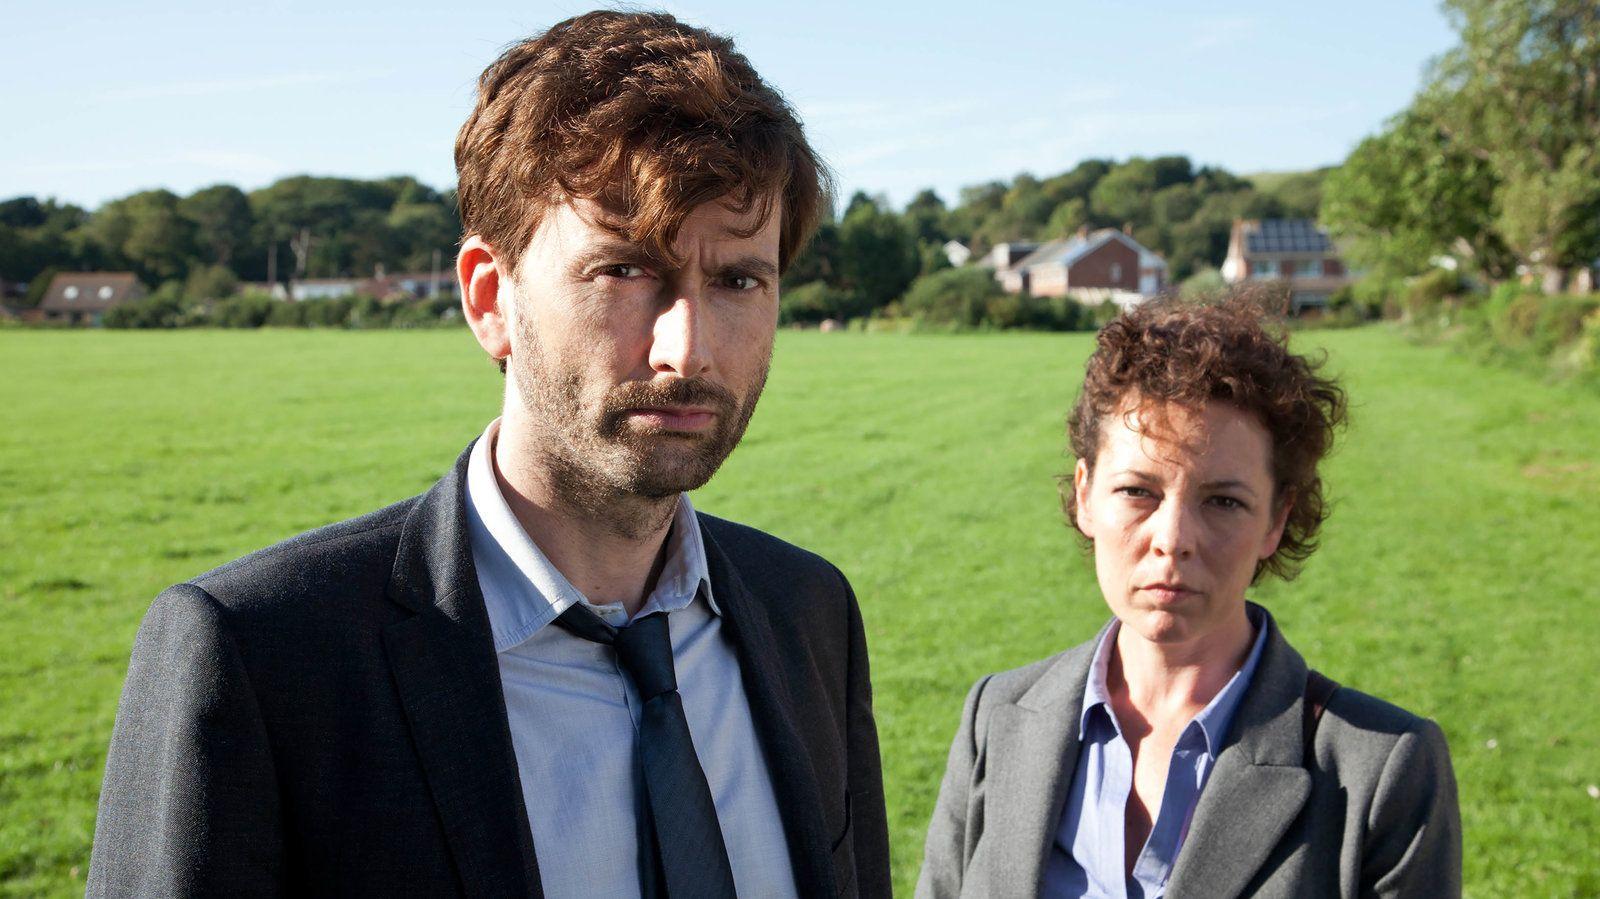 British detective shows detective shows detective